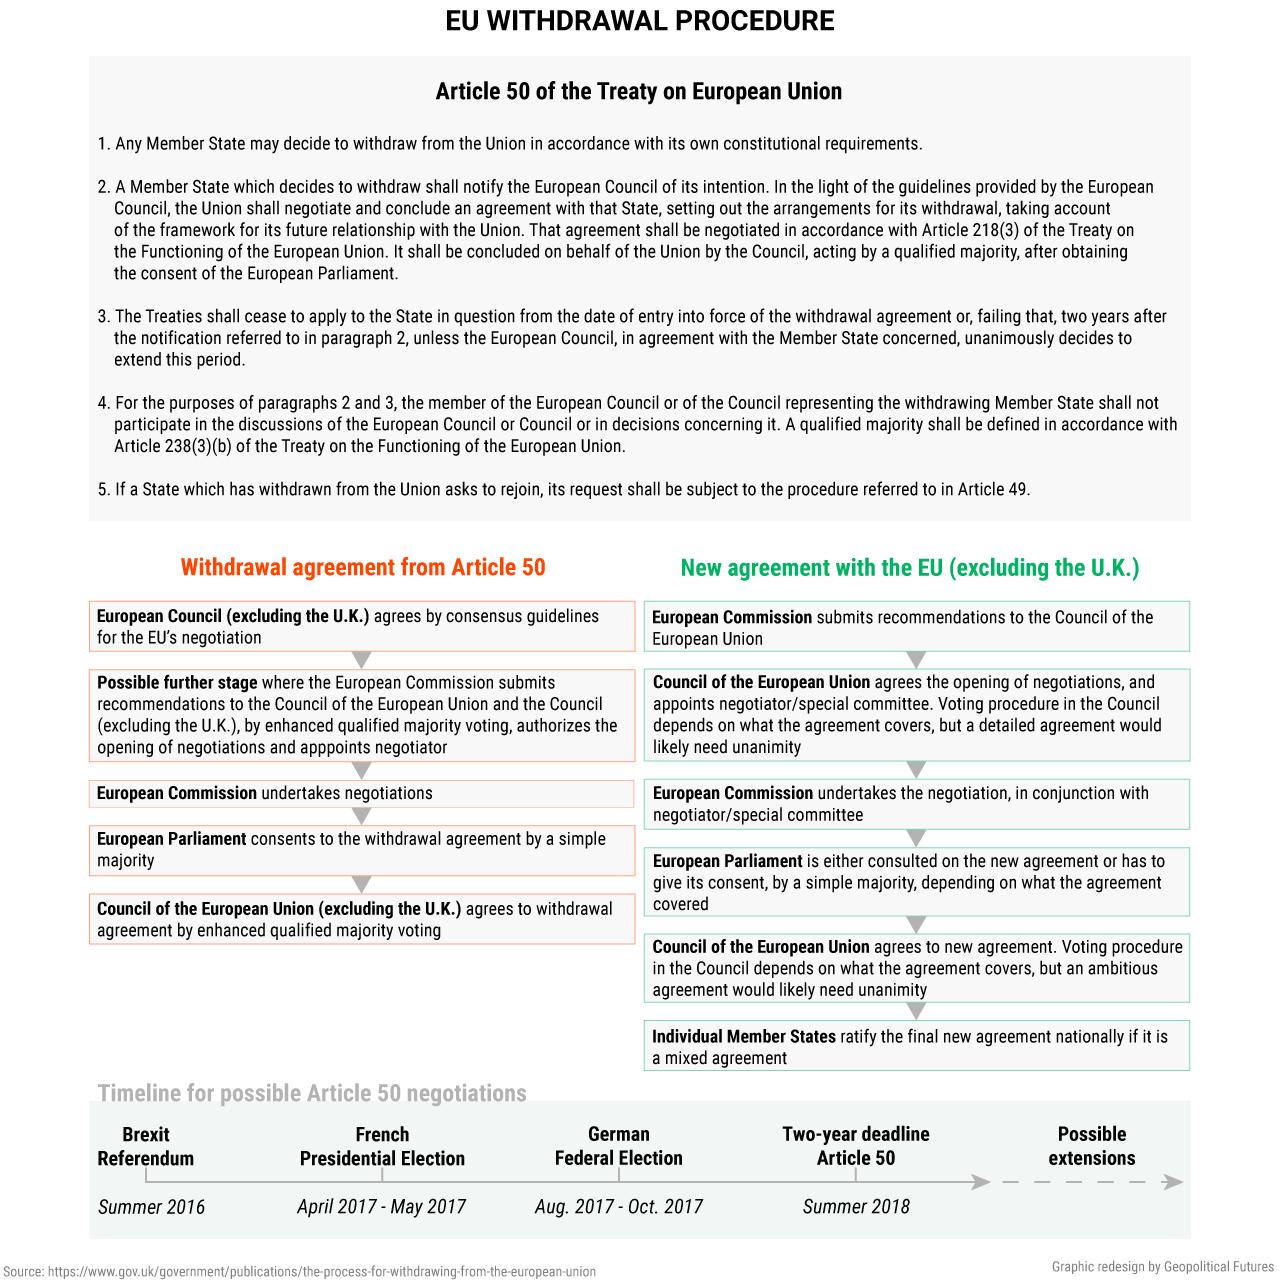 EU withdrawal procedure